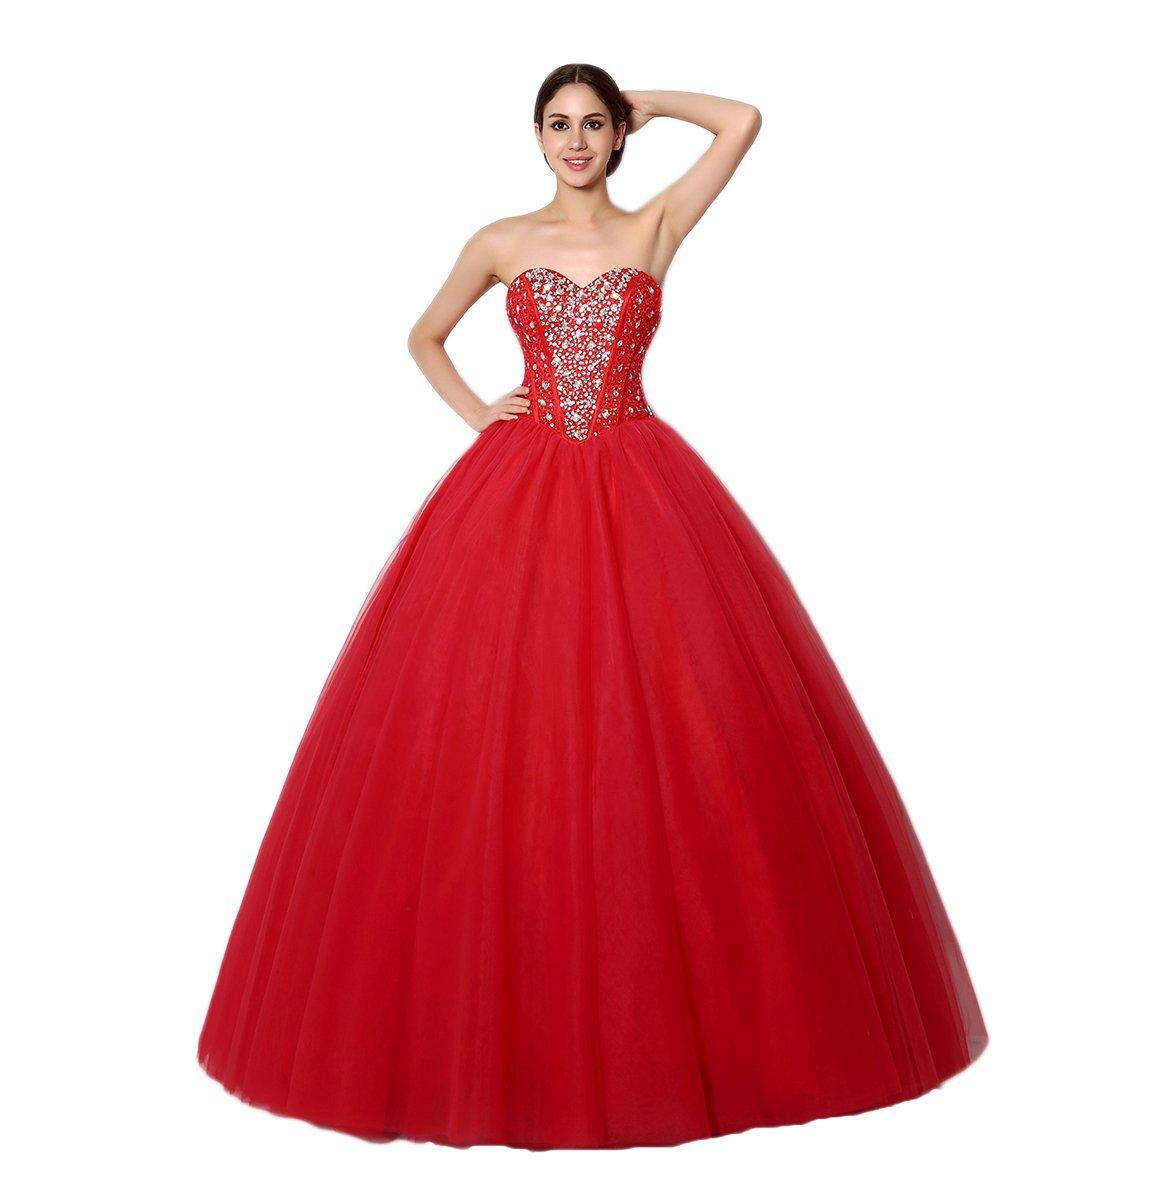 Love Dress Red Floor Length Quinceanera Dress Prom Dress Us 16